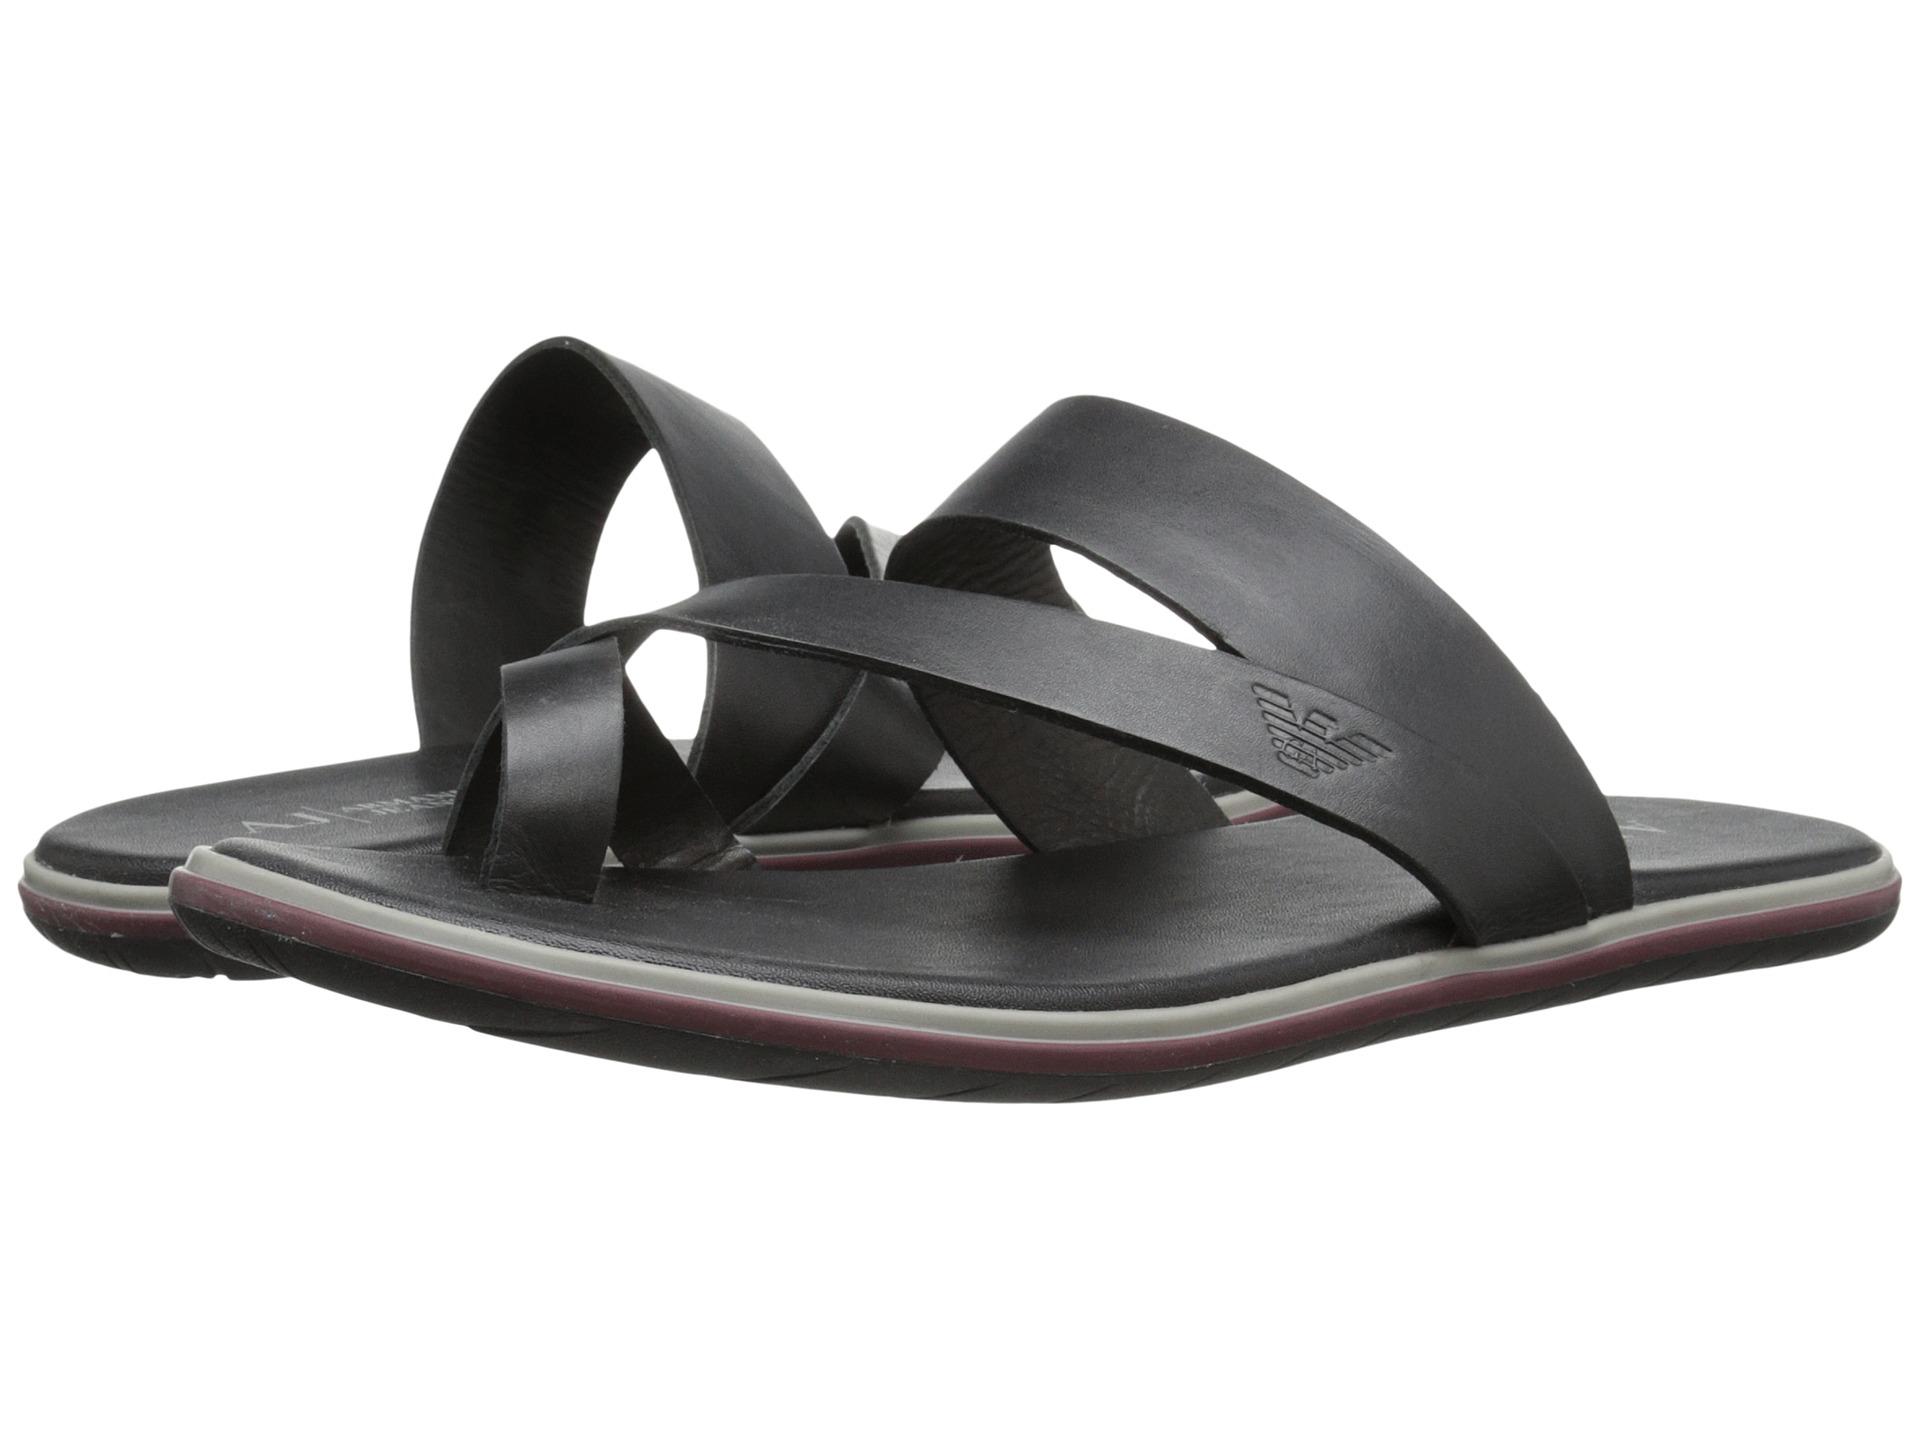 0c782974c Lyst - Armani Jeans Toe Lock Sandal in Black for Men